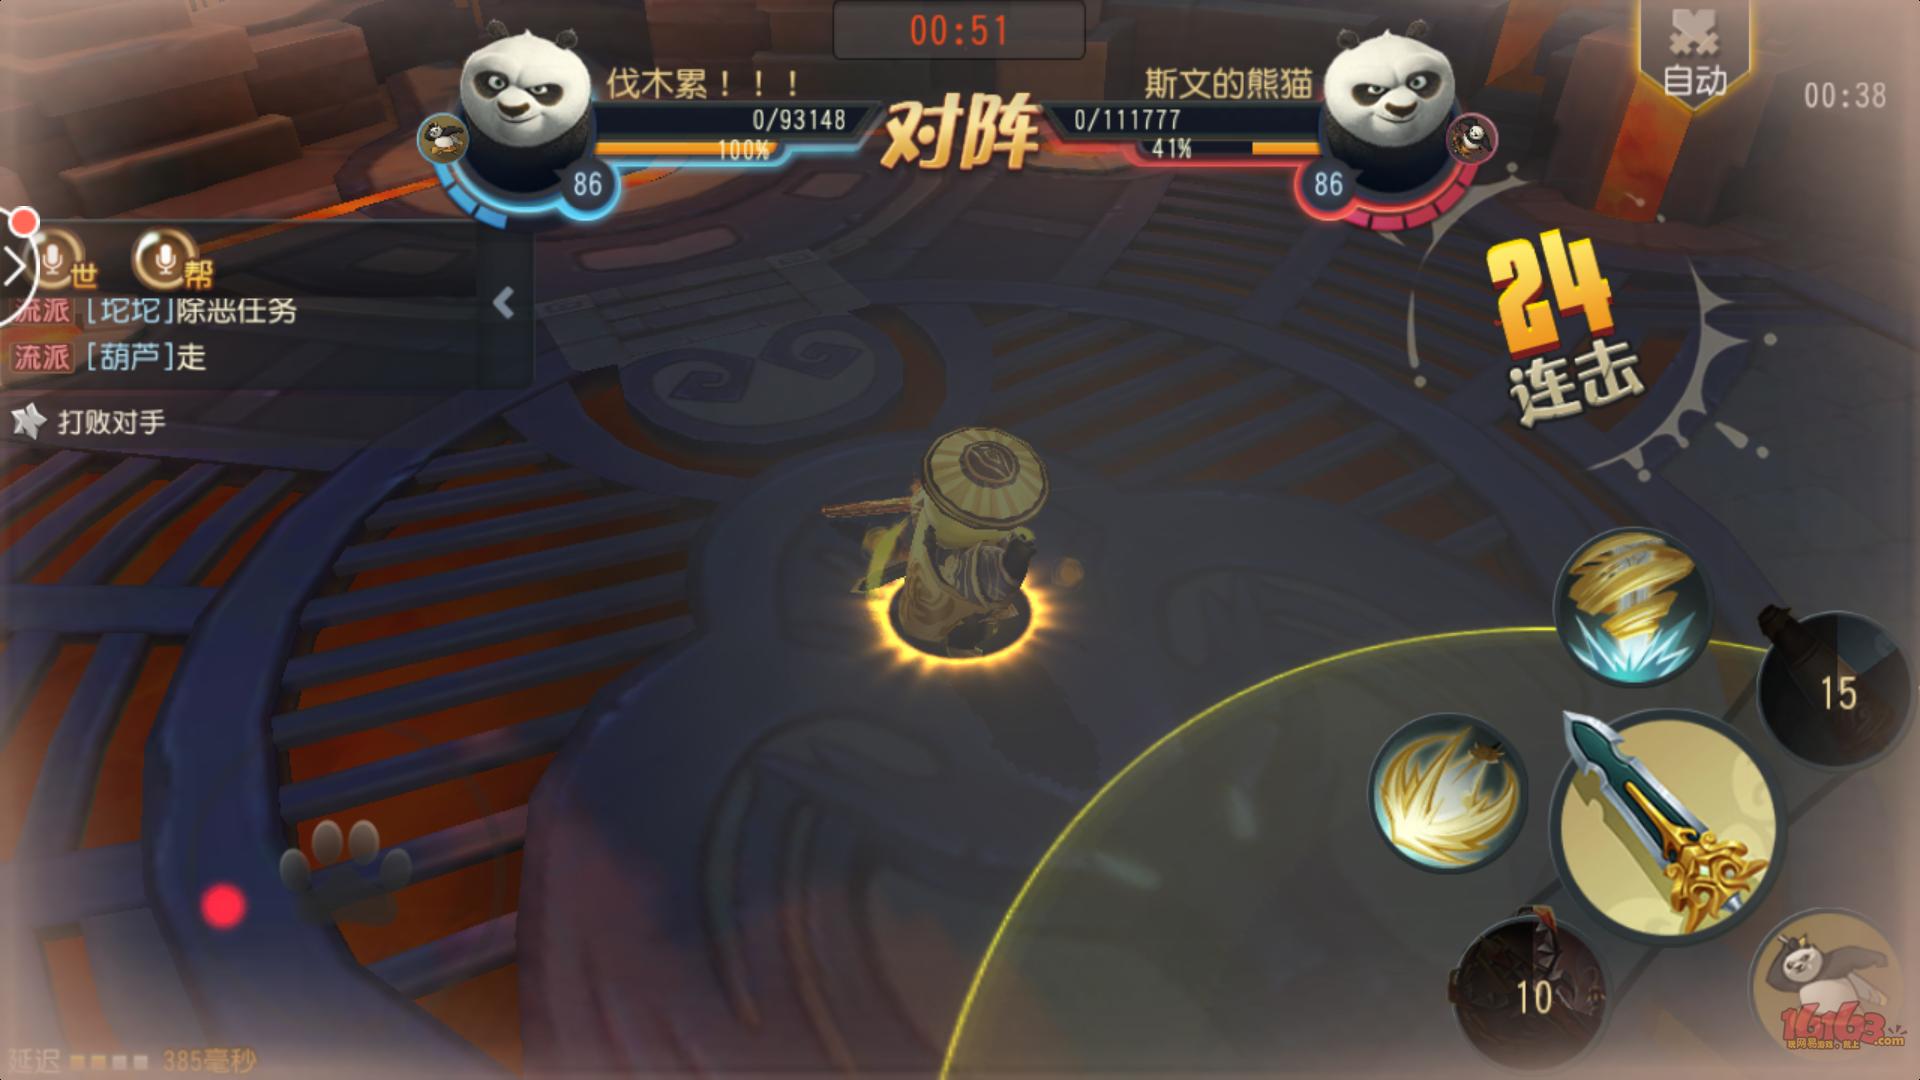 Screenshot_2016-12-01-18-04-39-483_功夫熊猫官方正版.png